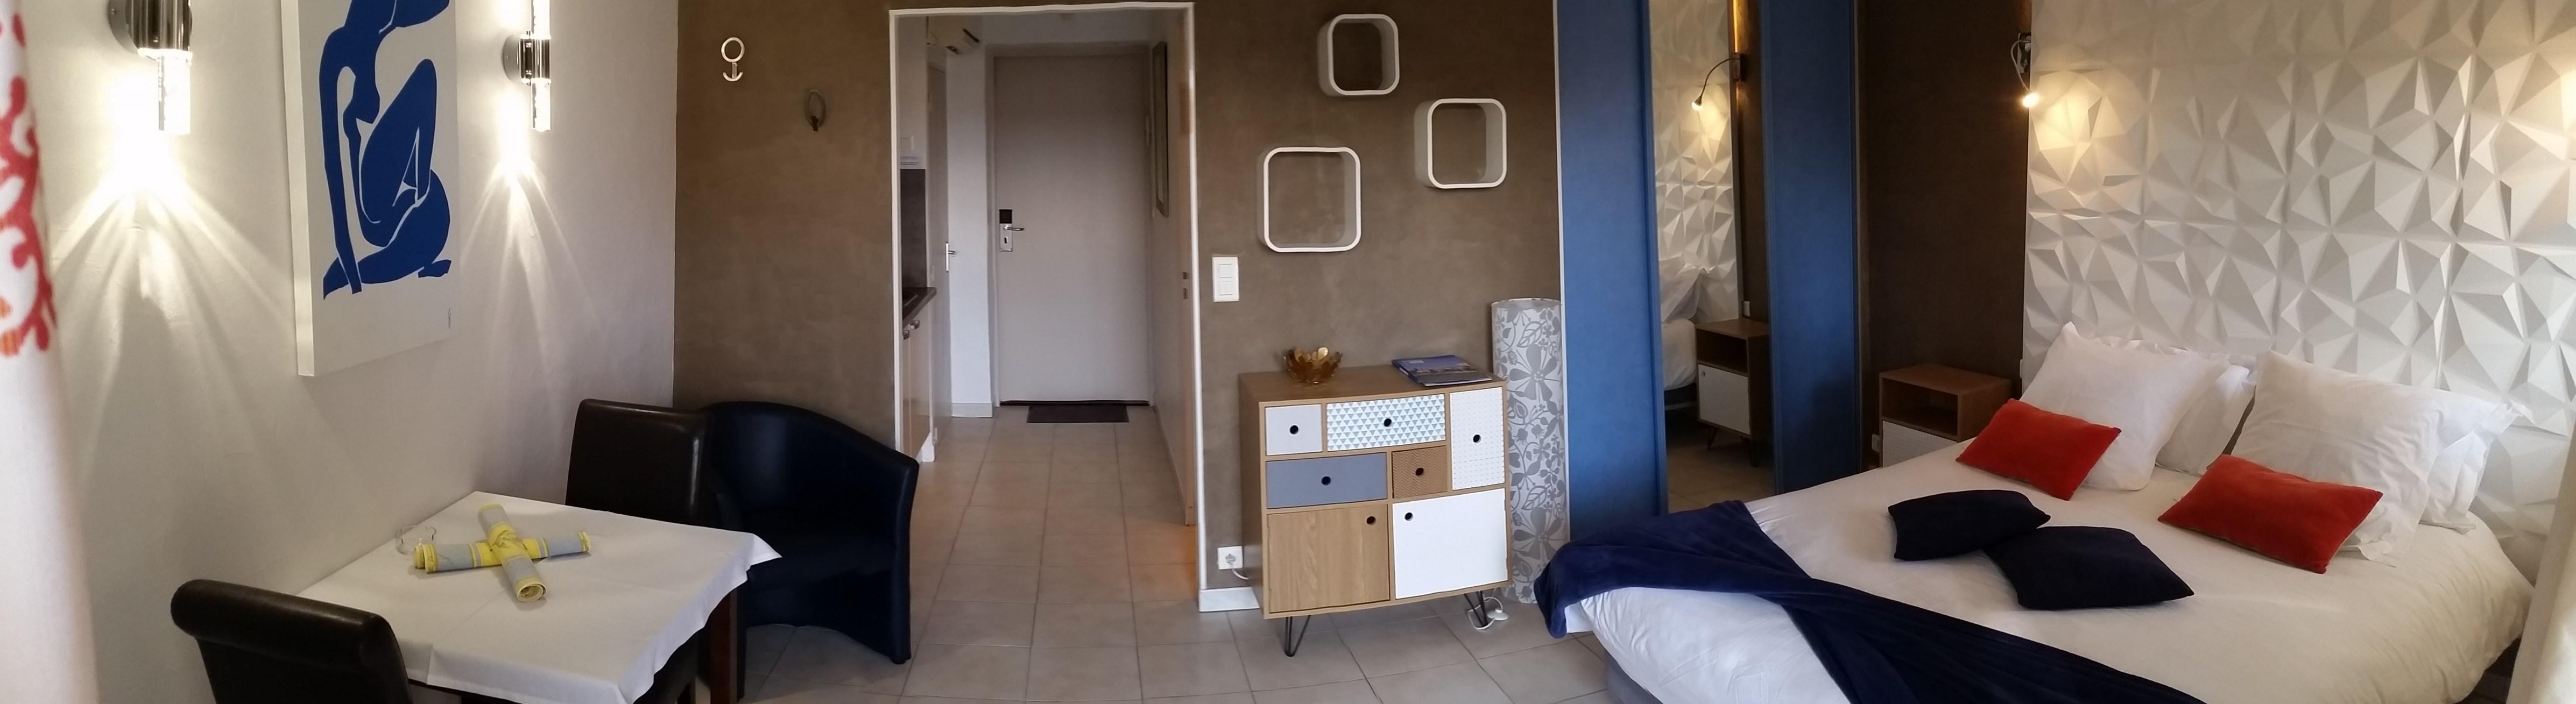 Pano_studio_Matisse_chambres_d'hotes_st_raphael_fréjus_var